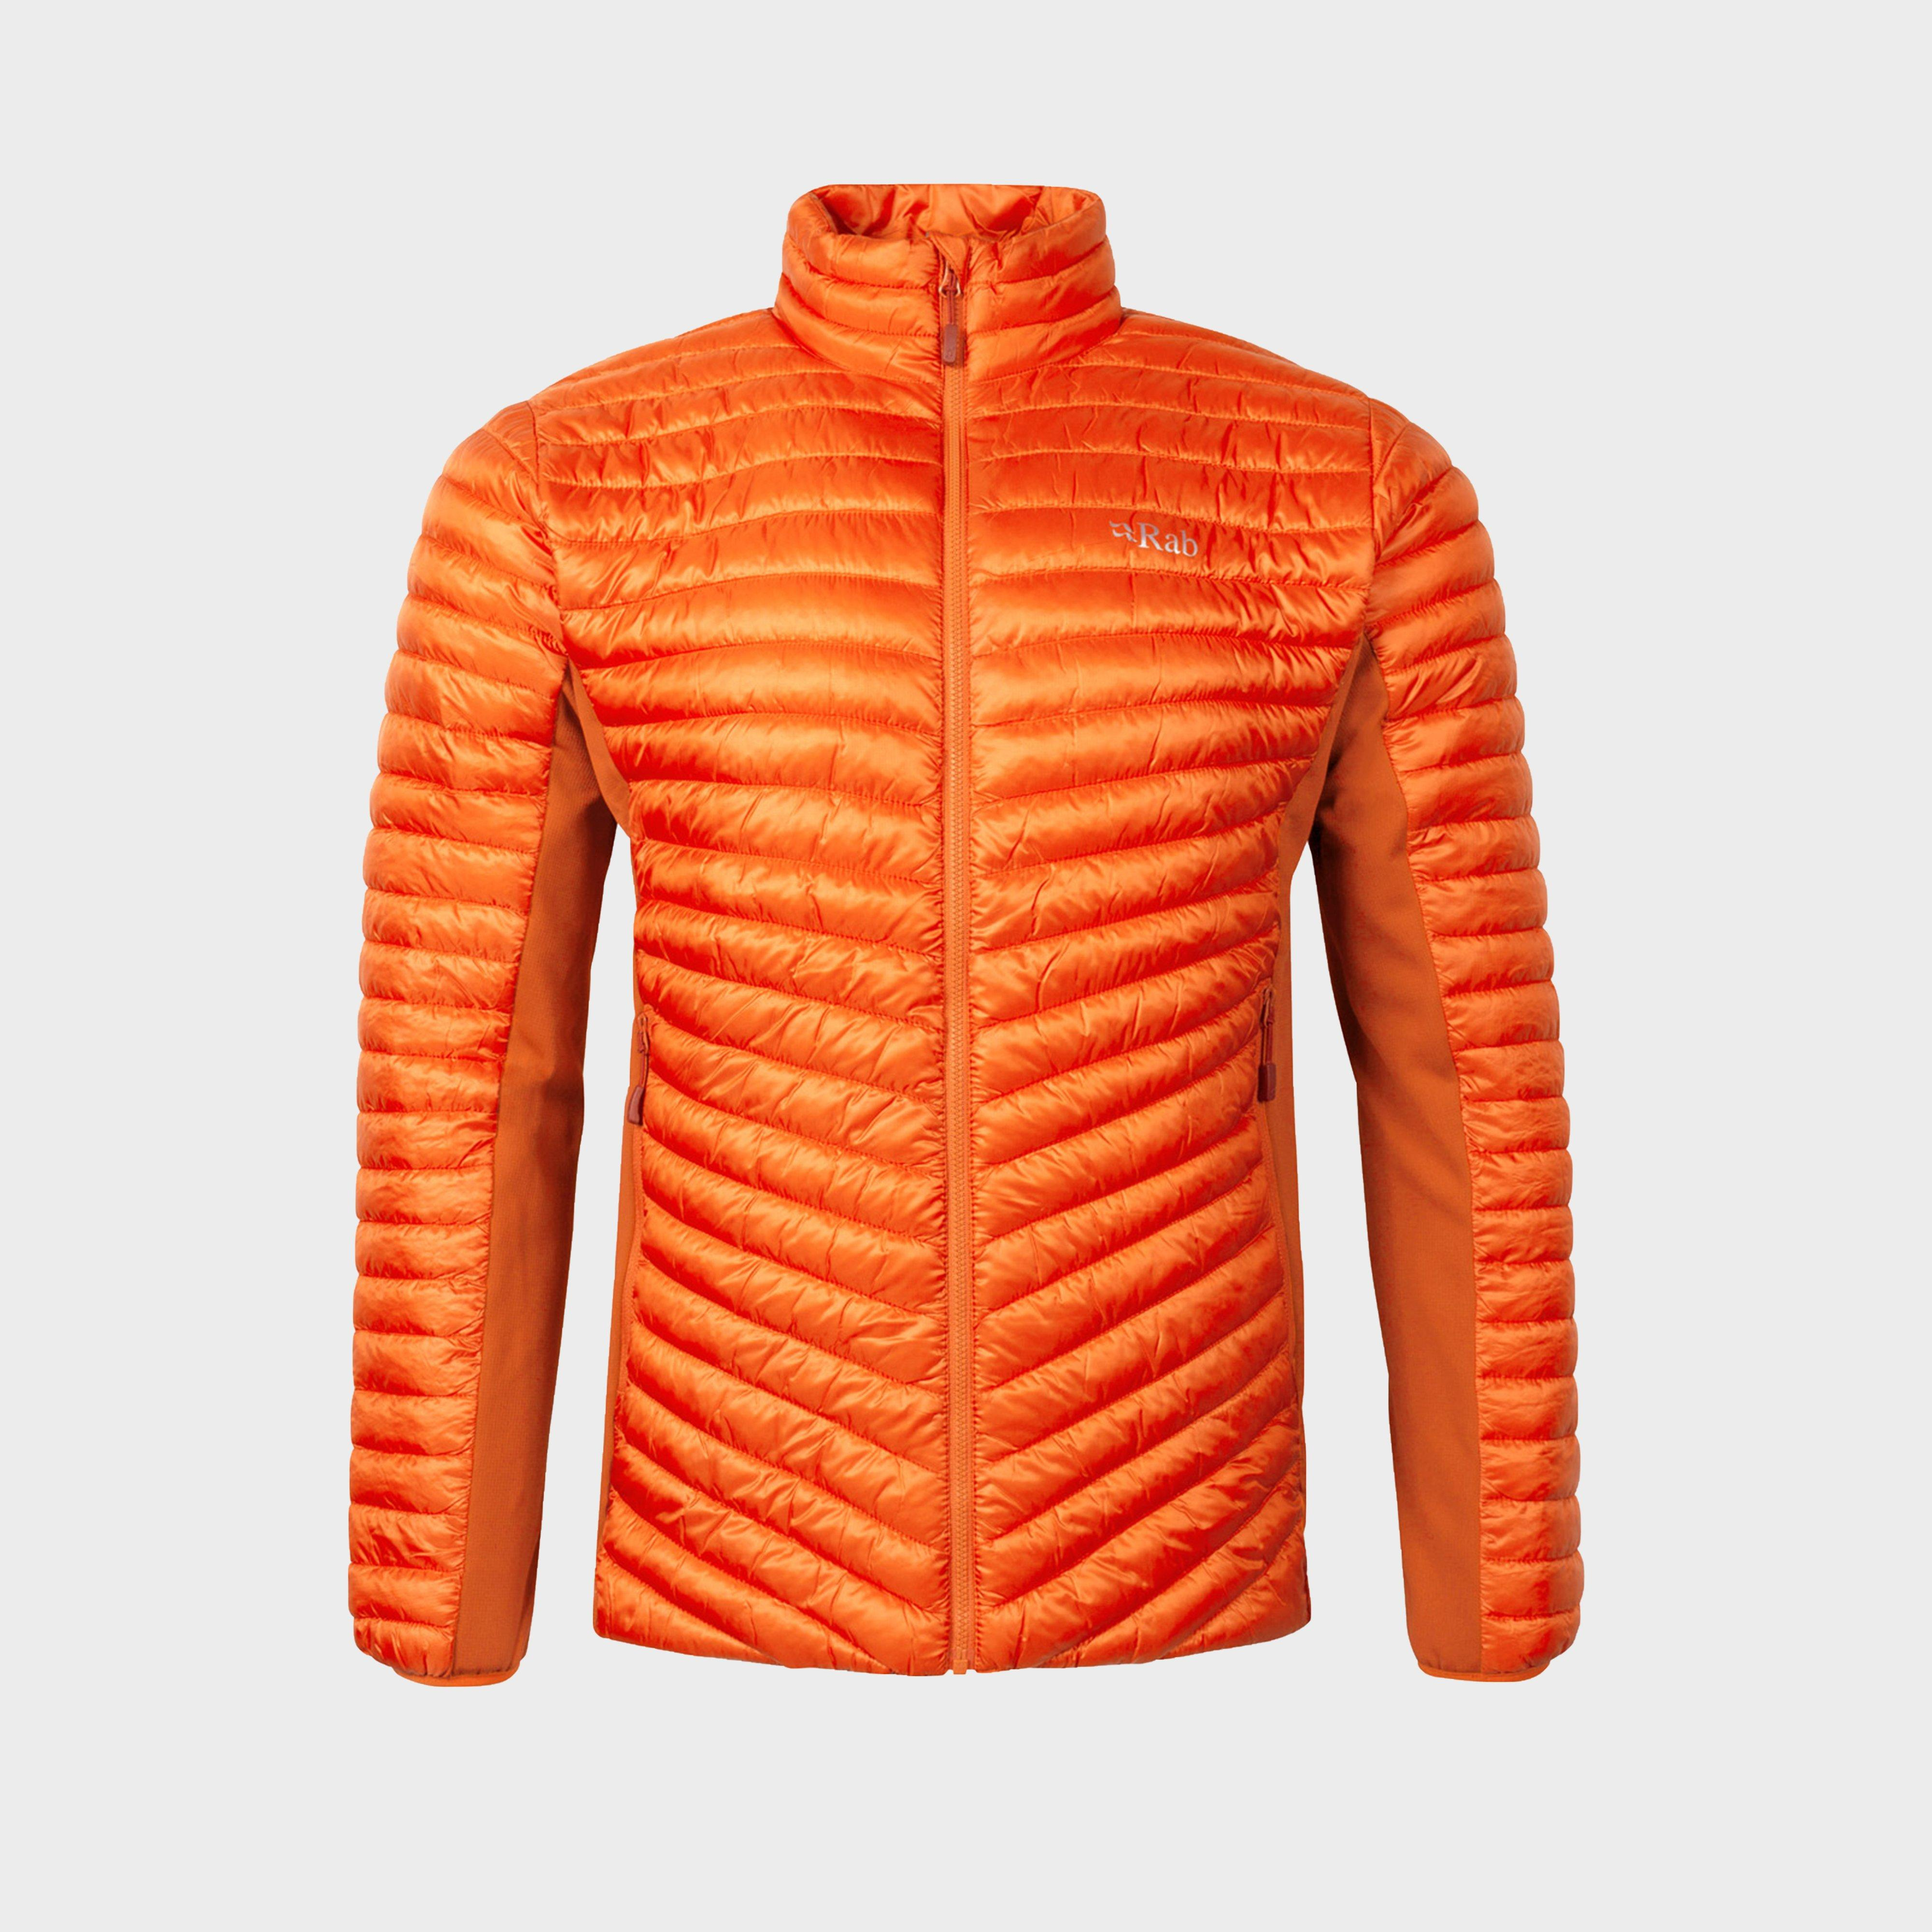 Rab Rab Mens Cirrus Flex Insulated  Jacket - N/A, N/A